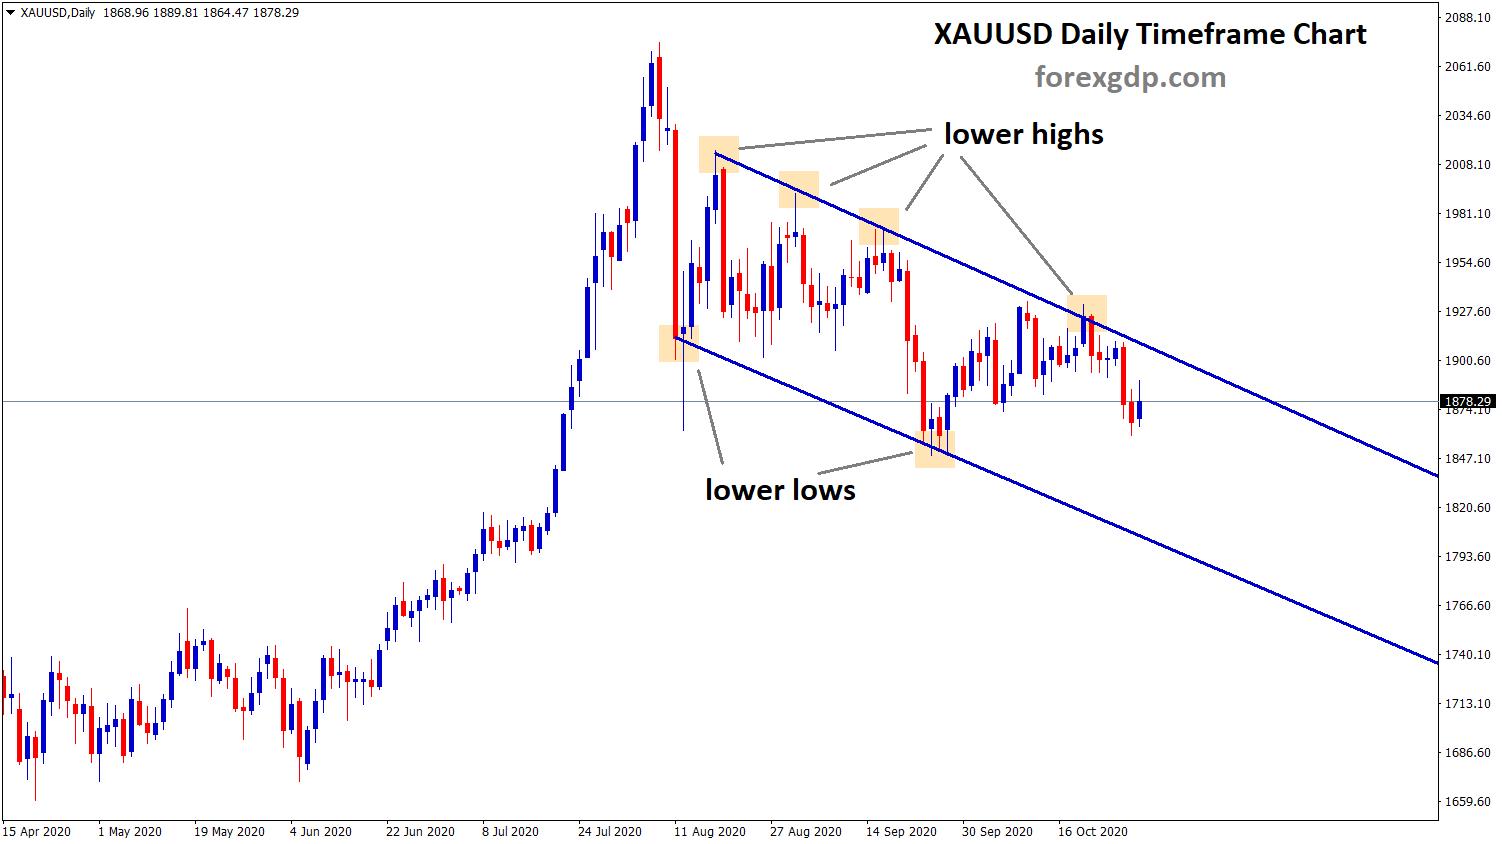 gold Descending channel in the peak price